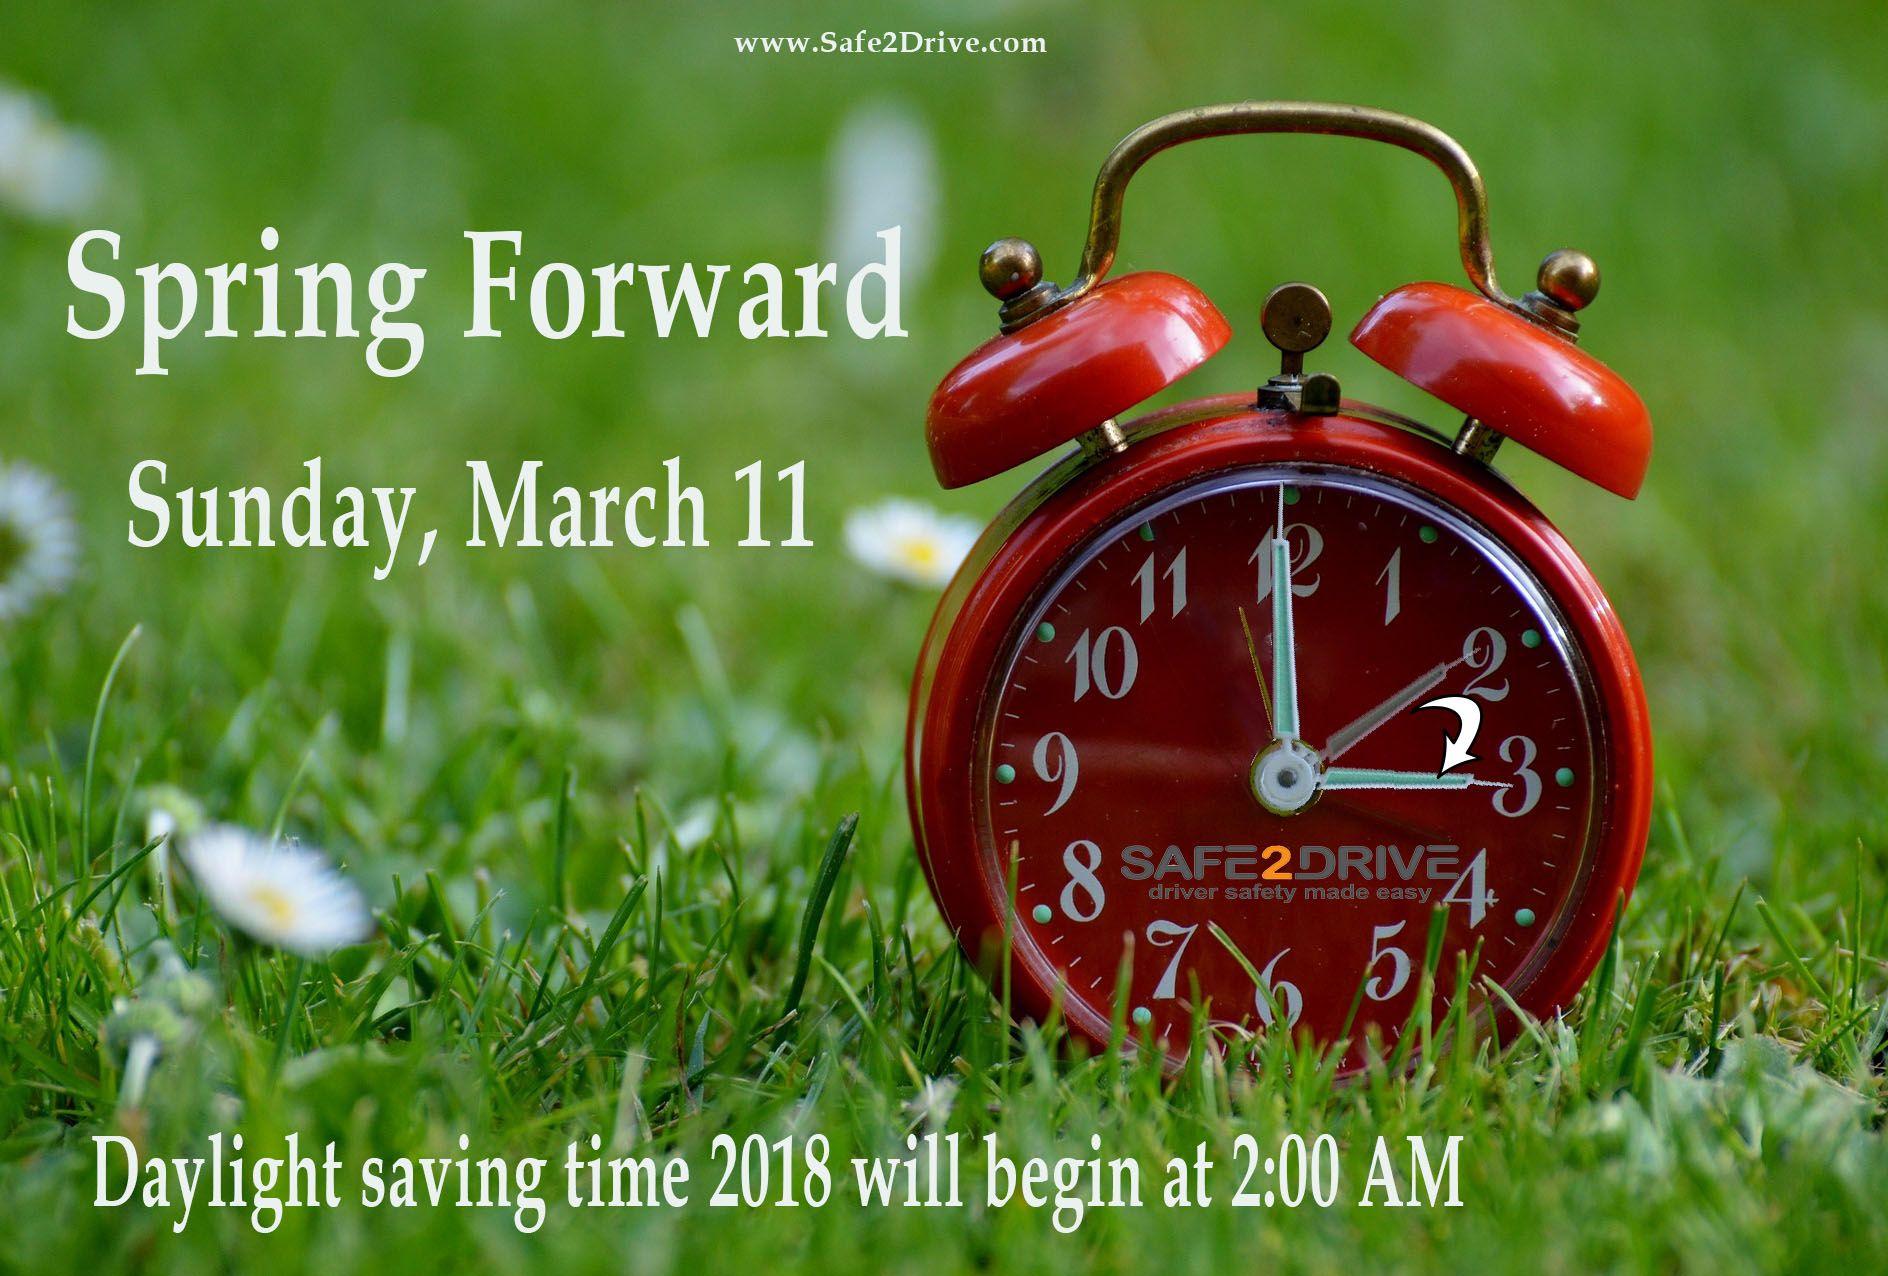 Spring Forward 2018 Daylight saving time 2018 will begin